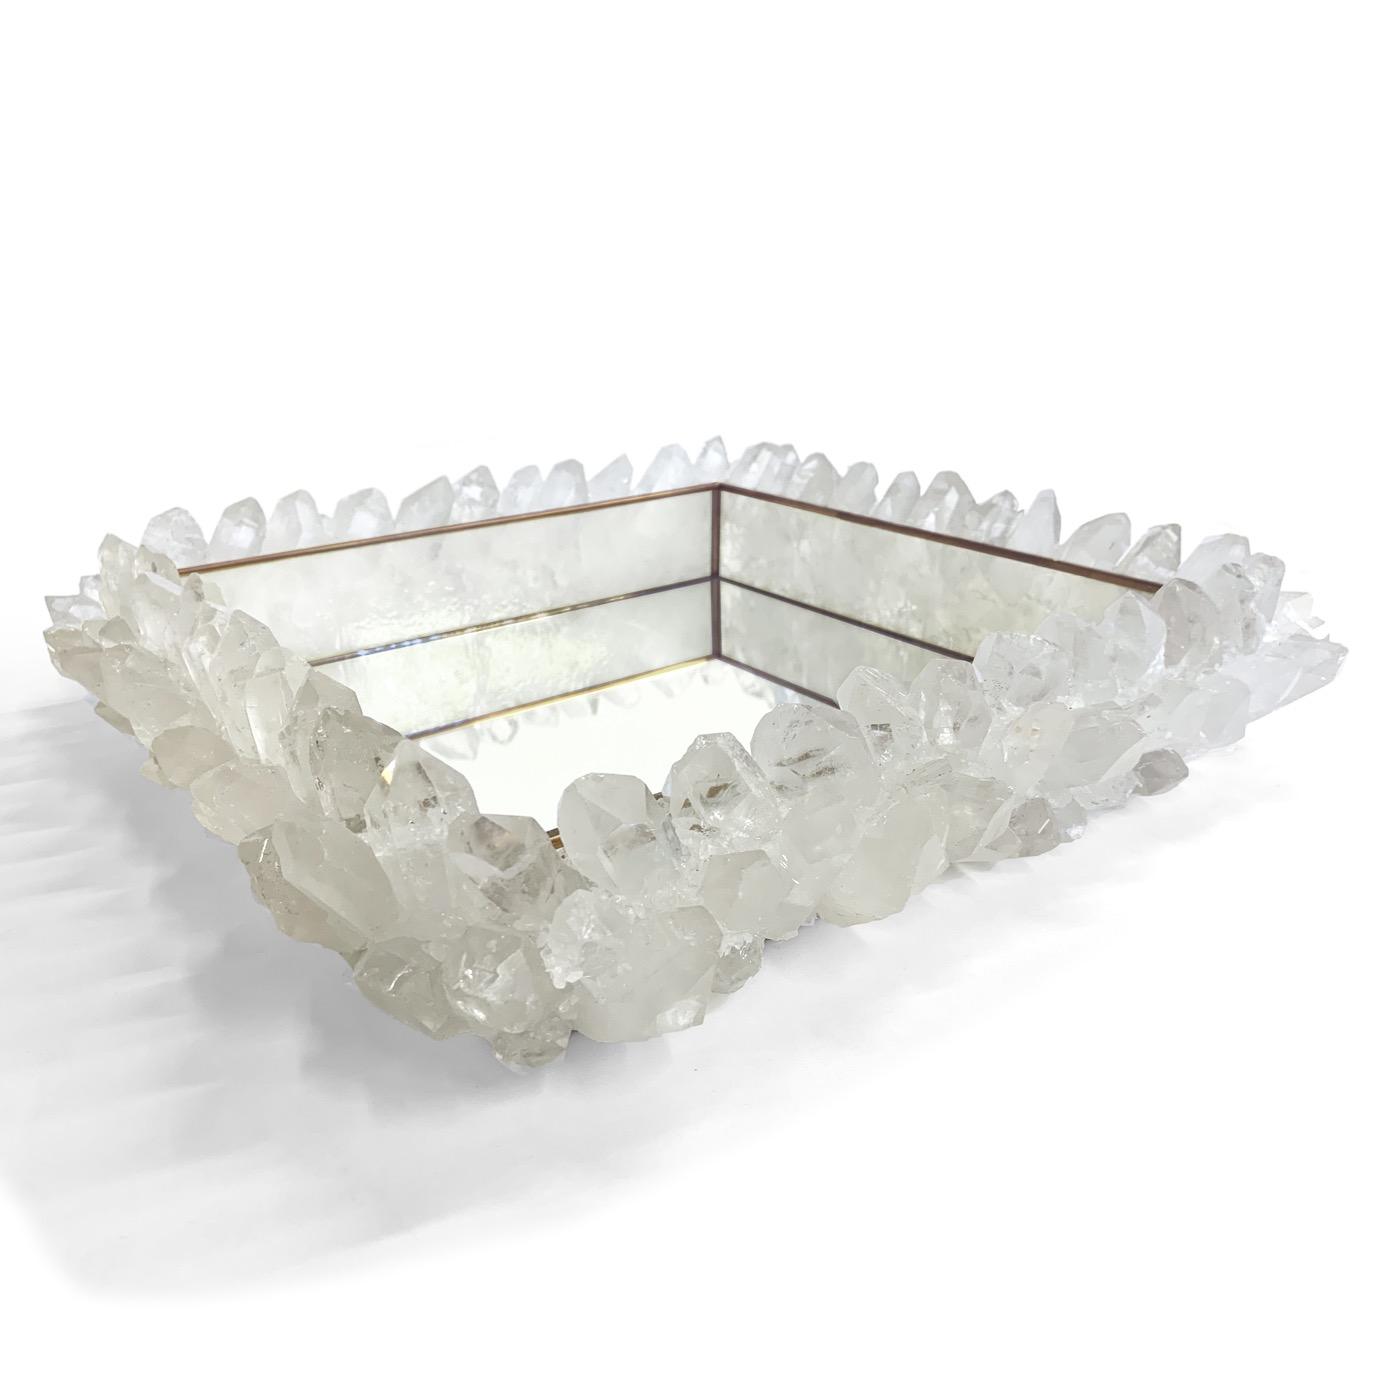 Maraba Mirrored Trays | Quartz